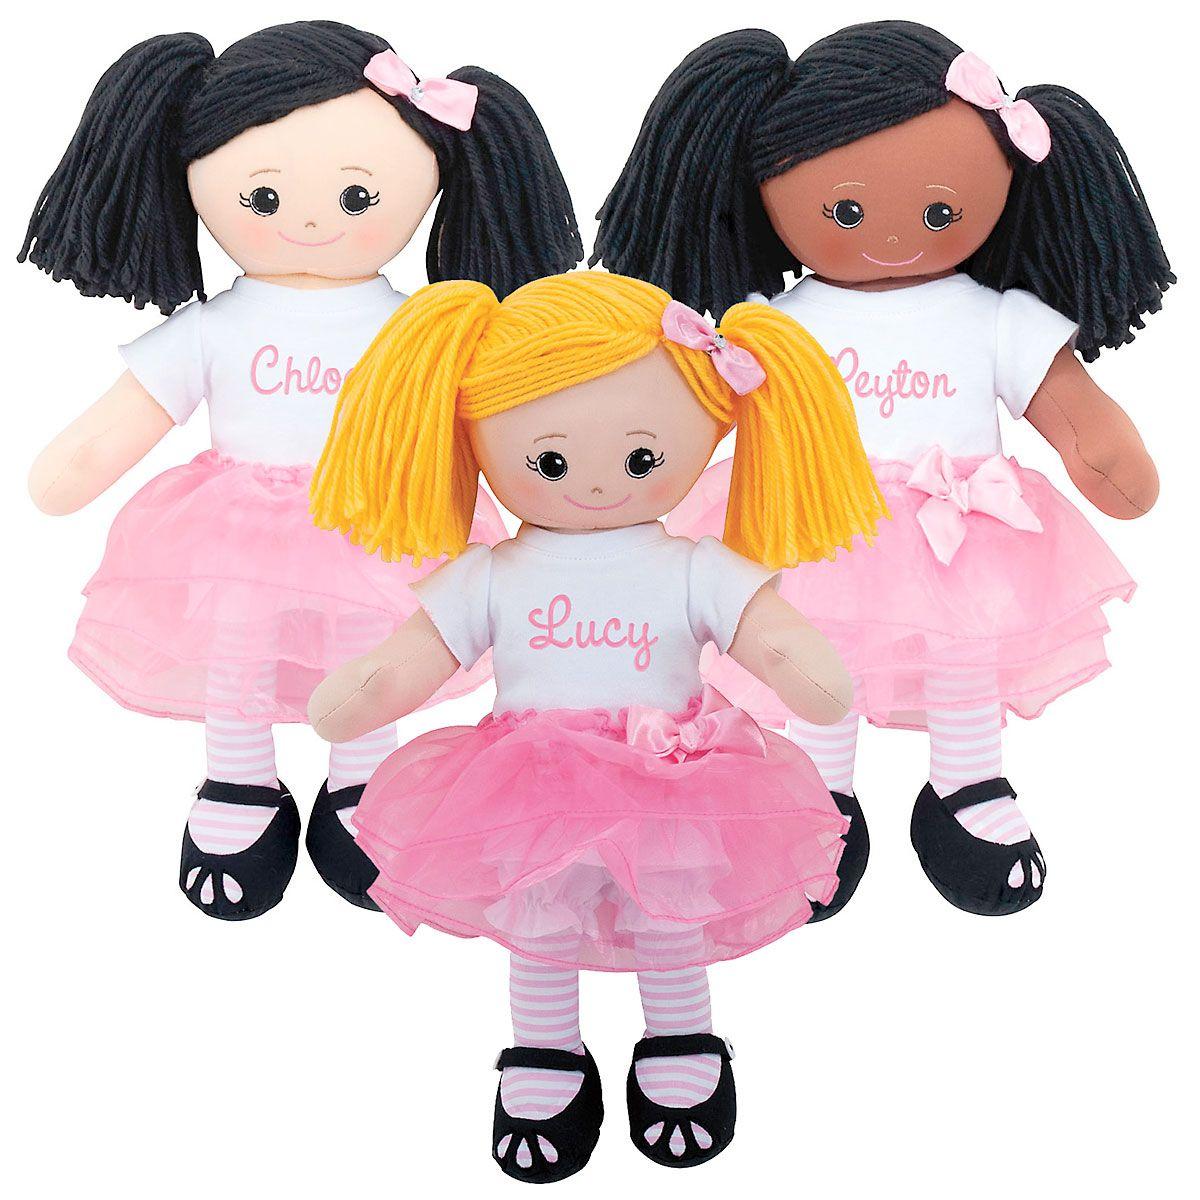 Ballerina Rag Doll with Tutu